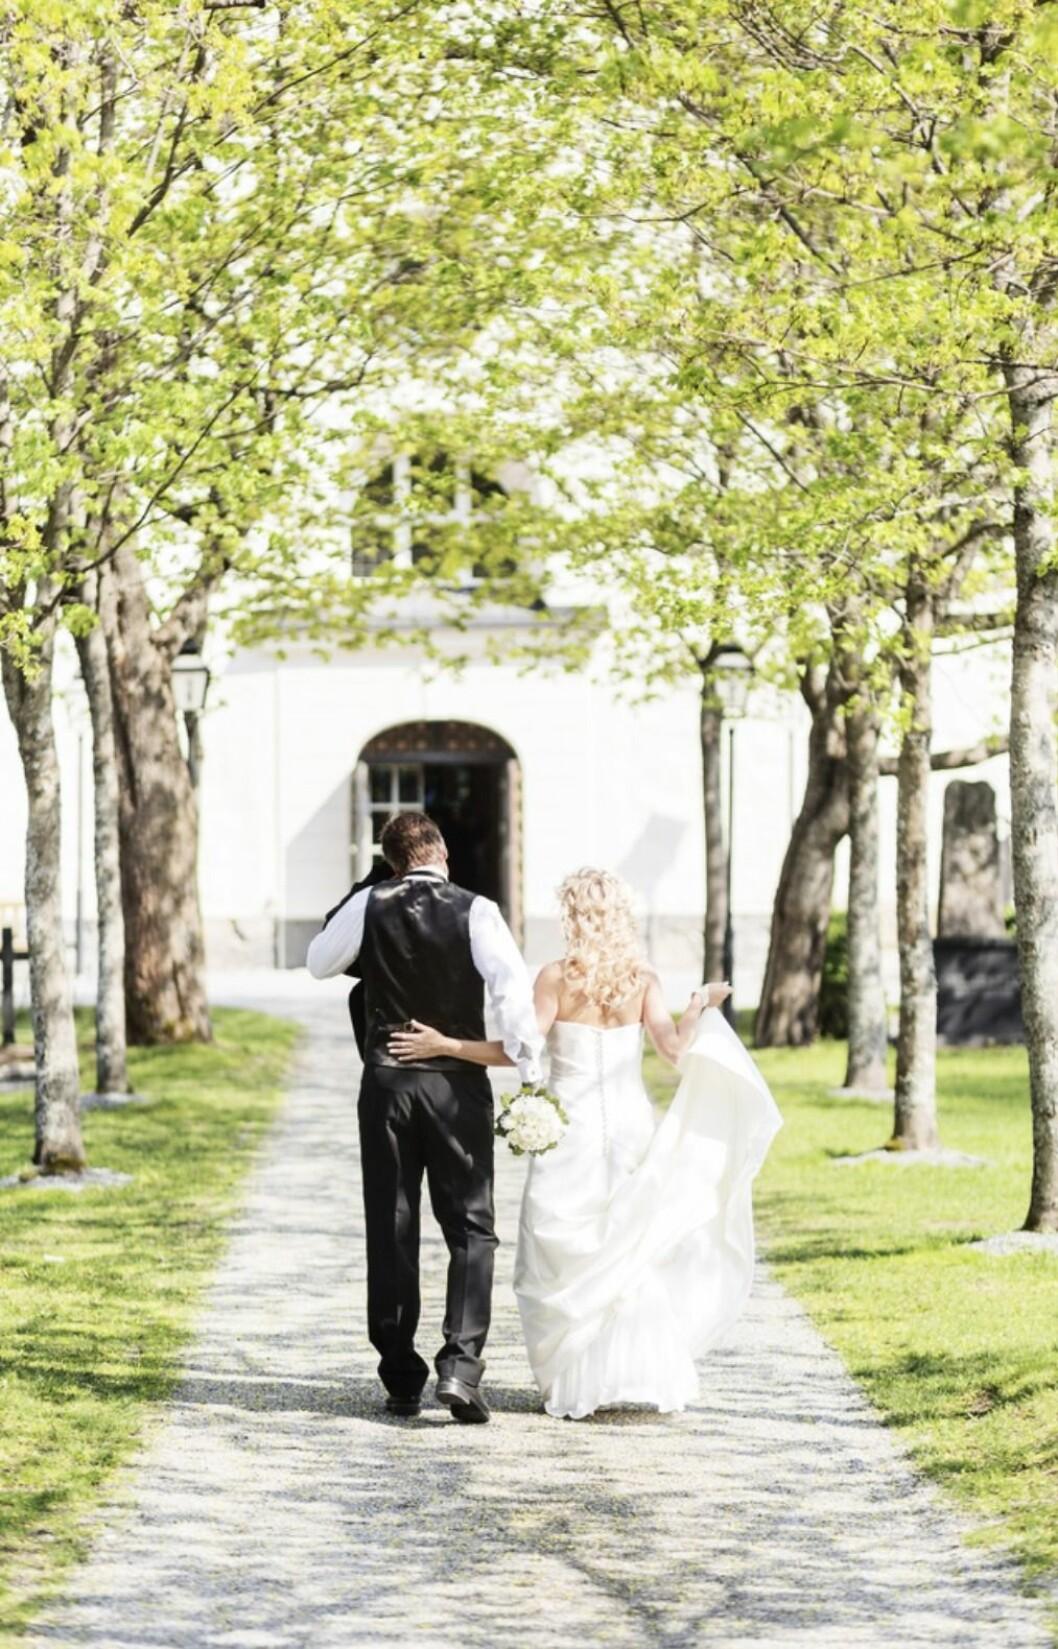 Kärlek, bröllop